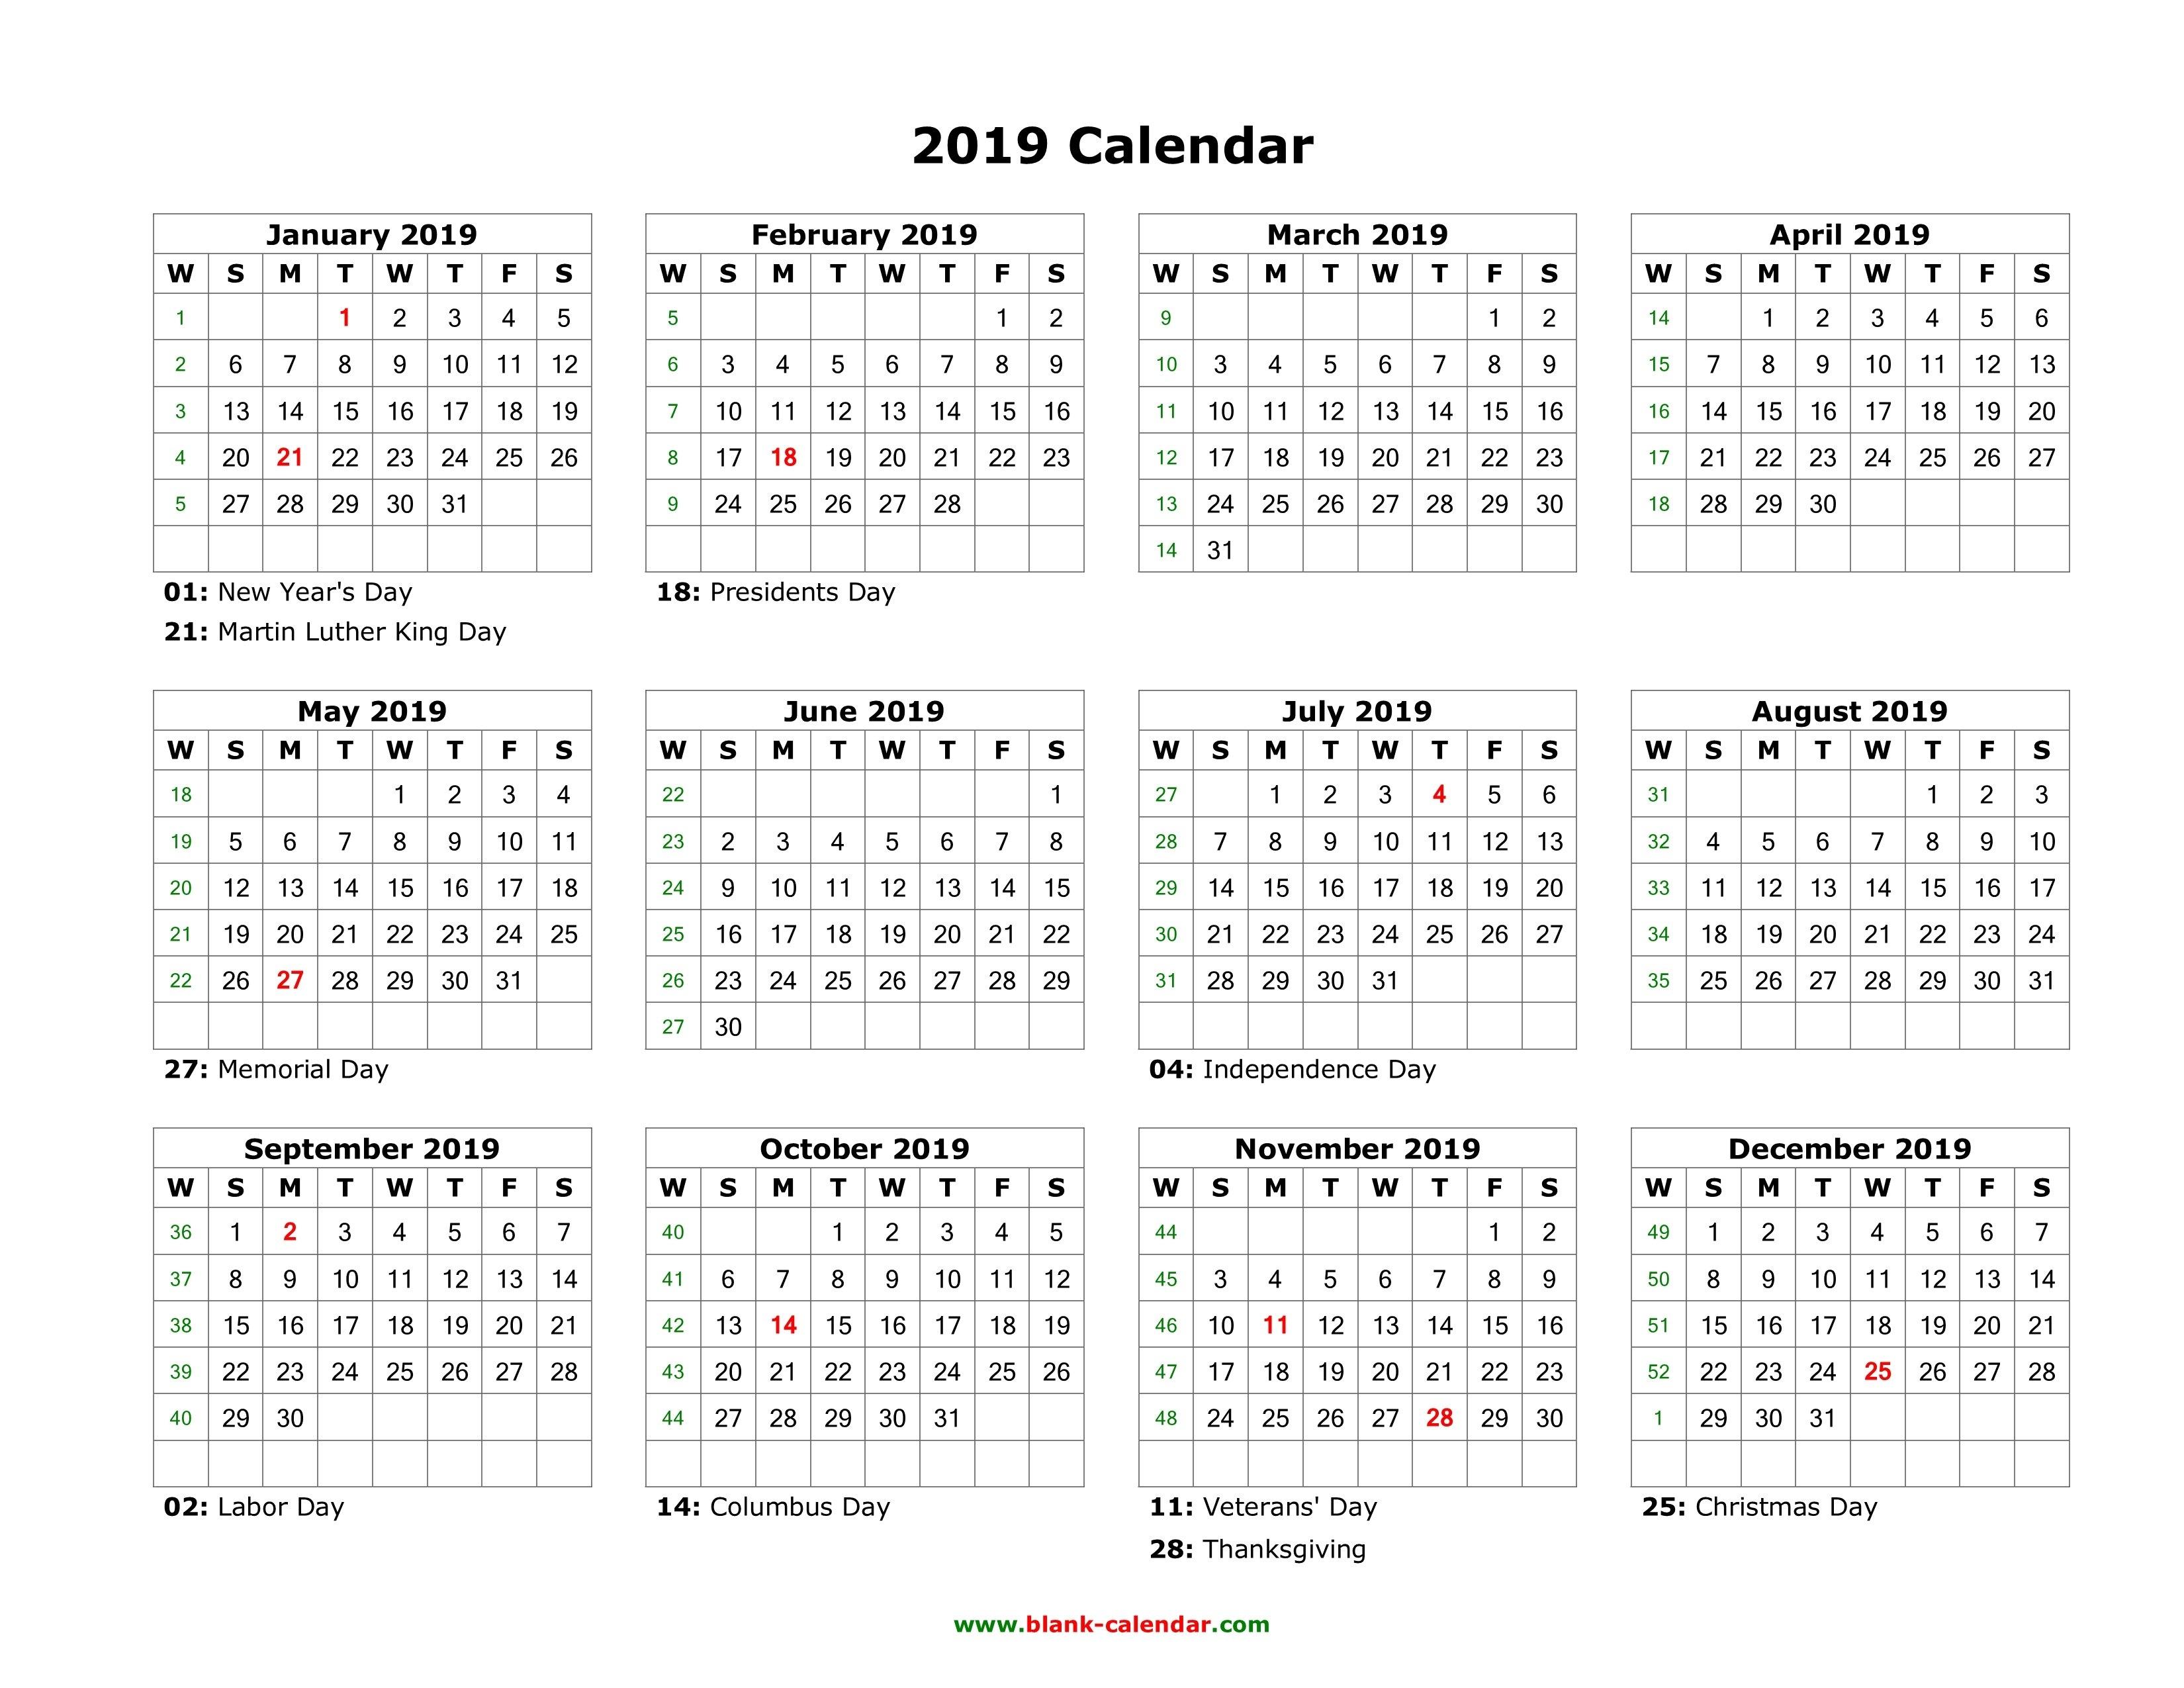 Blank Calendar 2019 | Free Download Calendar Templates Calendar 2019 Free Print